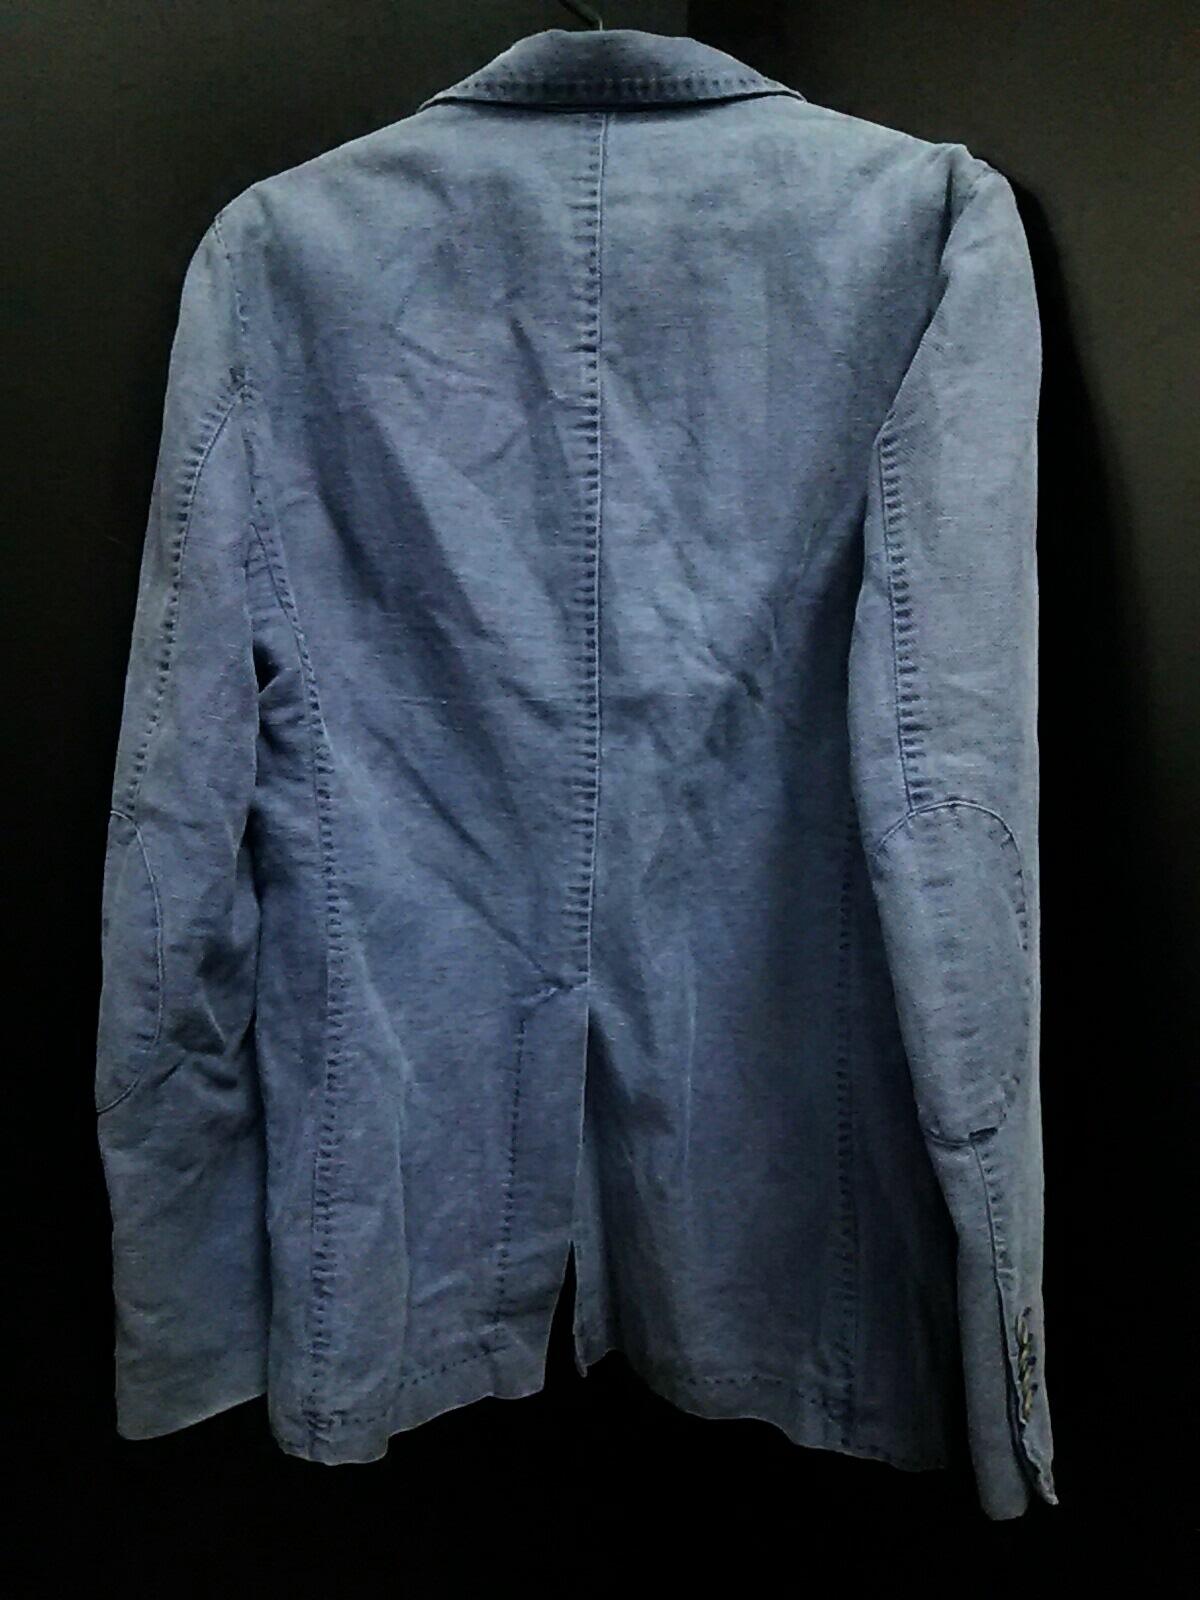 Massimo Dutti(マッシモドゥッティ)のジャケット